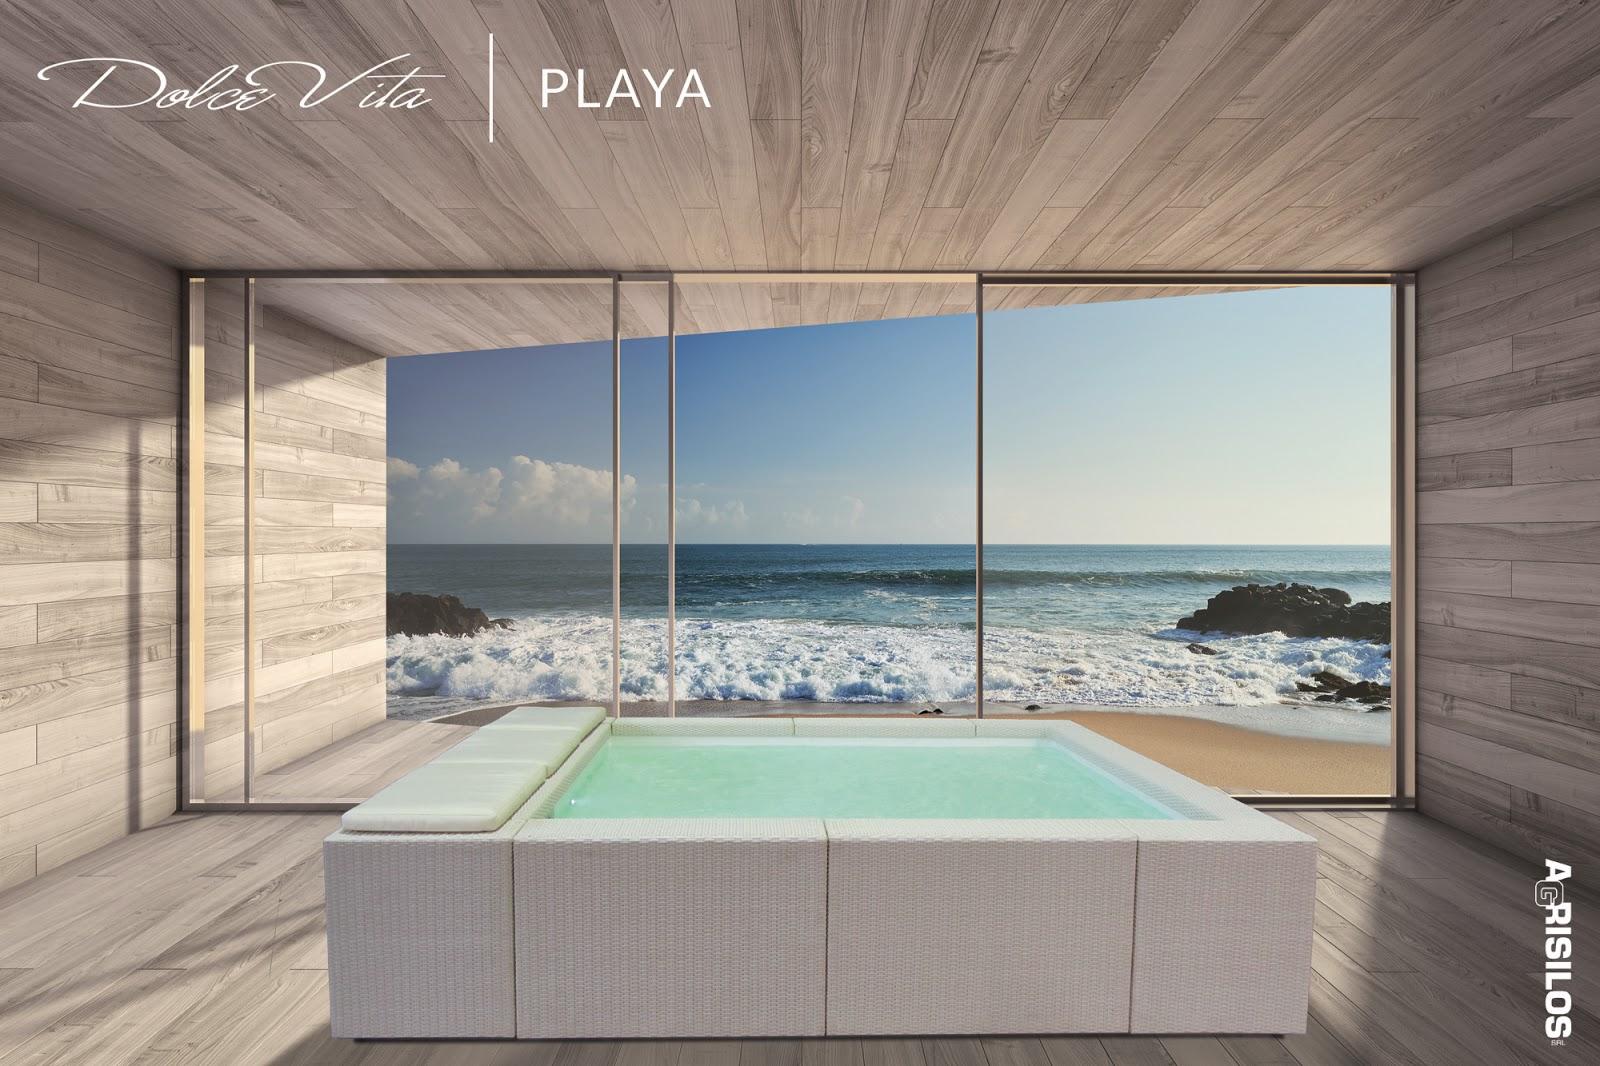 Nuova laghetto dolcevita playa piscine laghetto news blog - Piscine laghetto playa ...